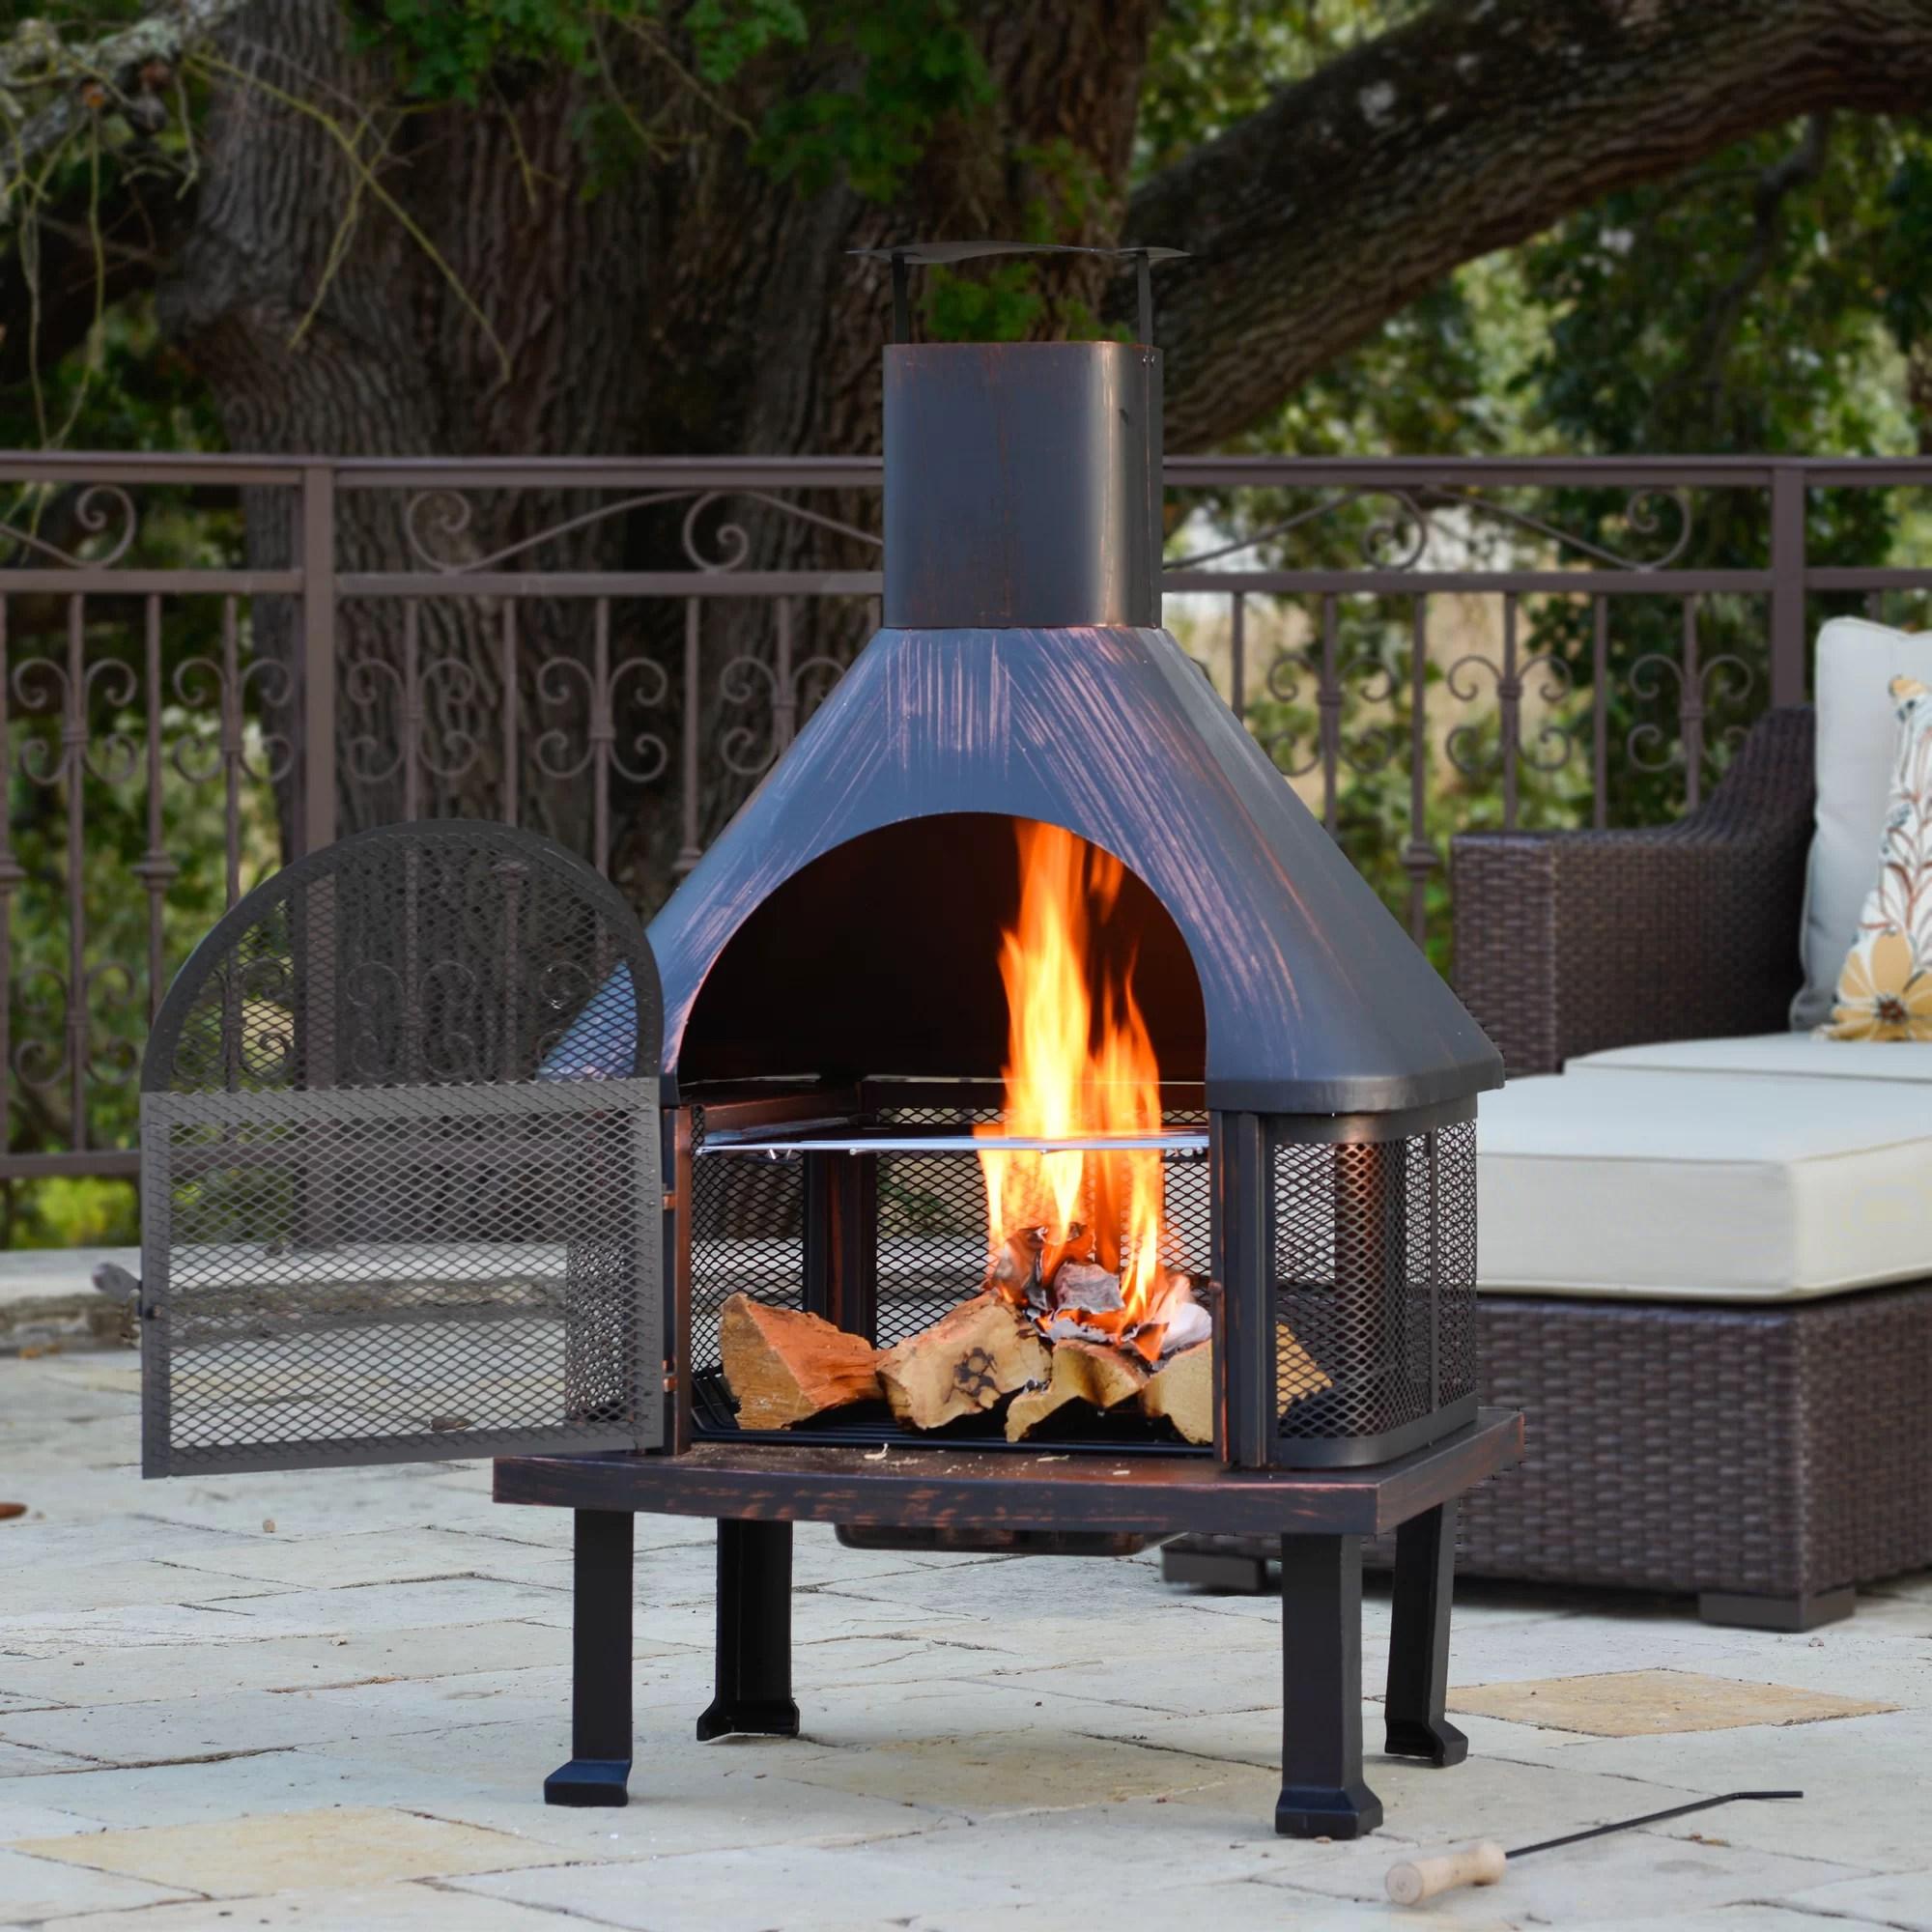 Borealis Fuoco Steel Wood Burning Outdoor Fireplace ... on Quillen Steel Outdoor Fireplace  id=43838